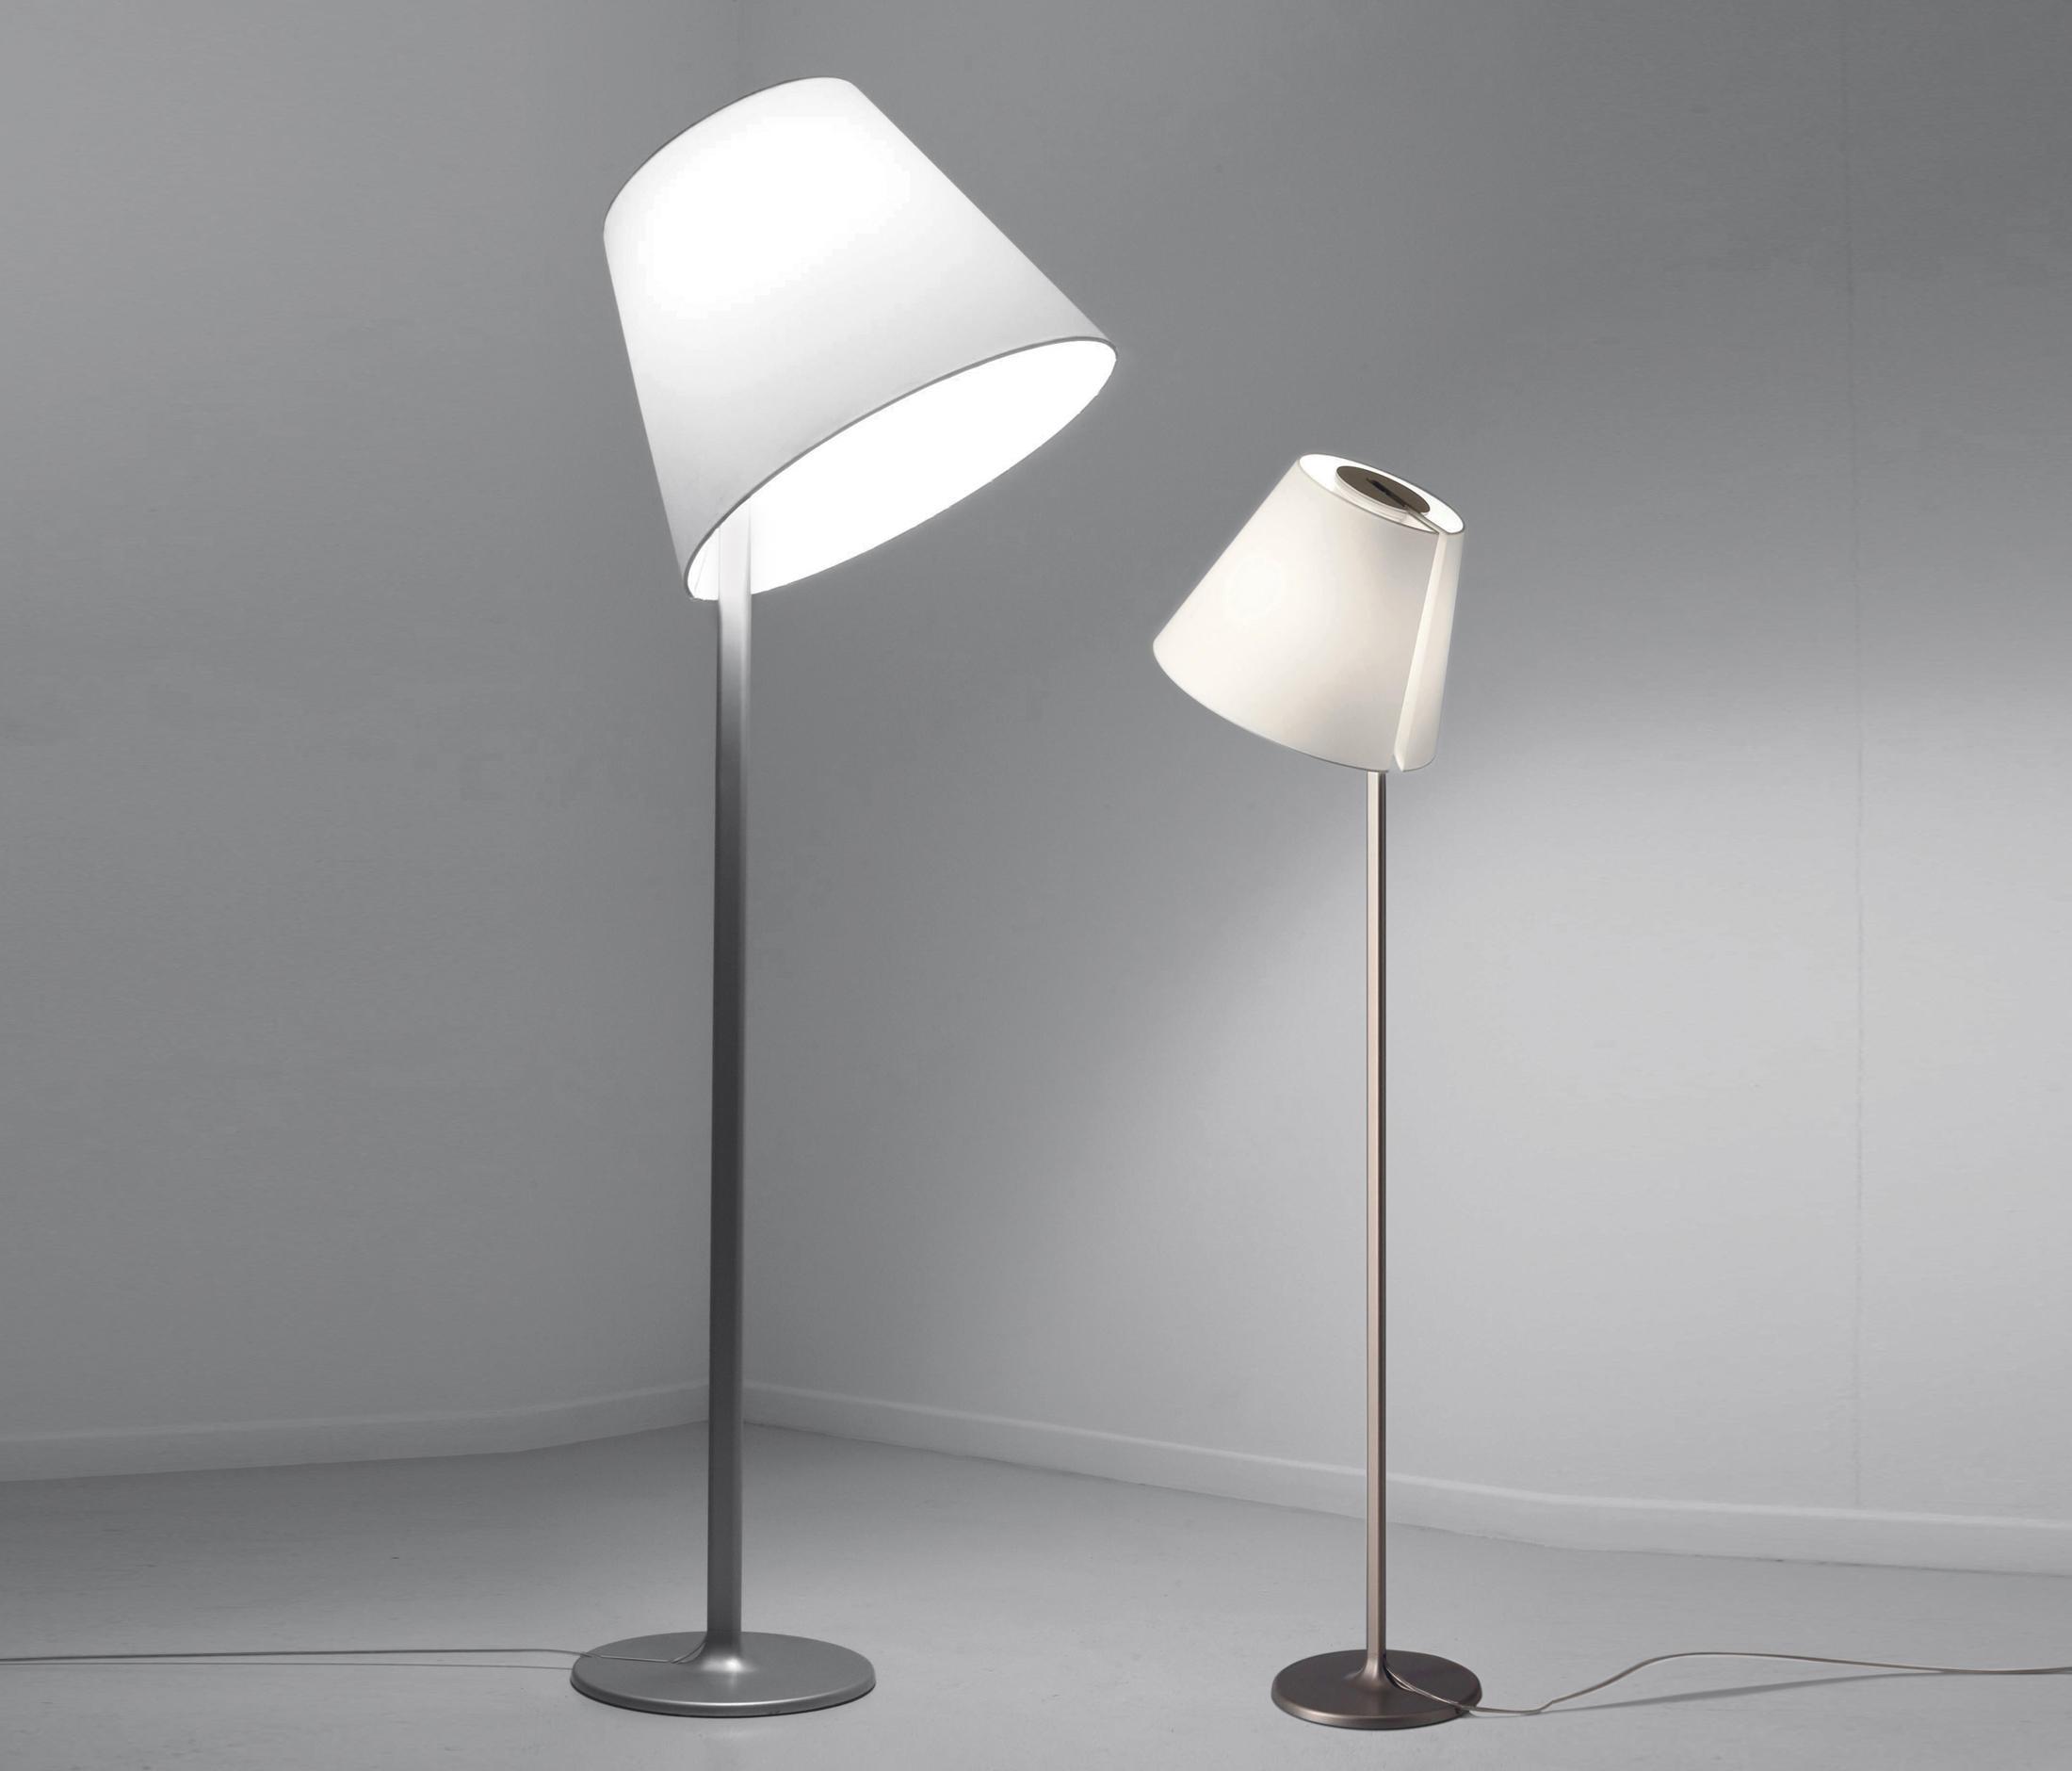 Melampo floor lamp free standing lights from artemide architonic melampo floor lamp by artemide free standing lights aloadofball Images